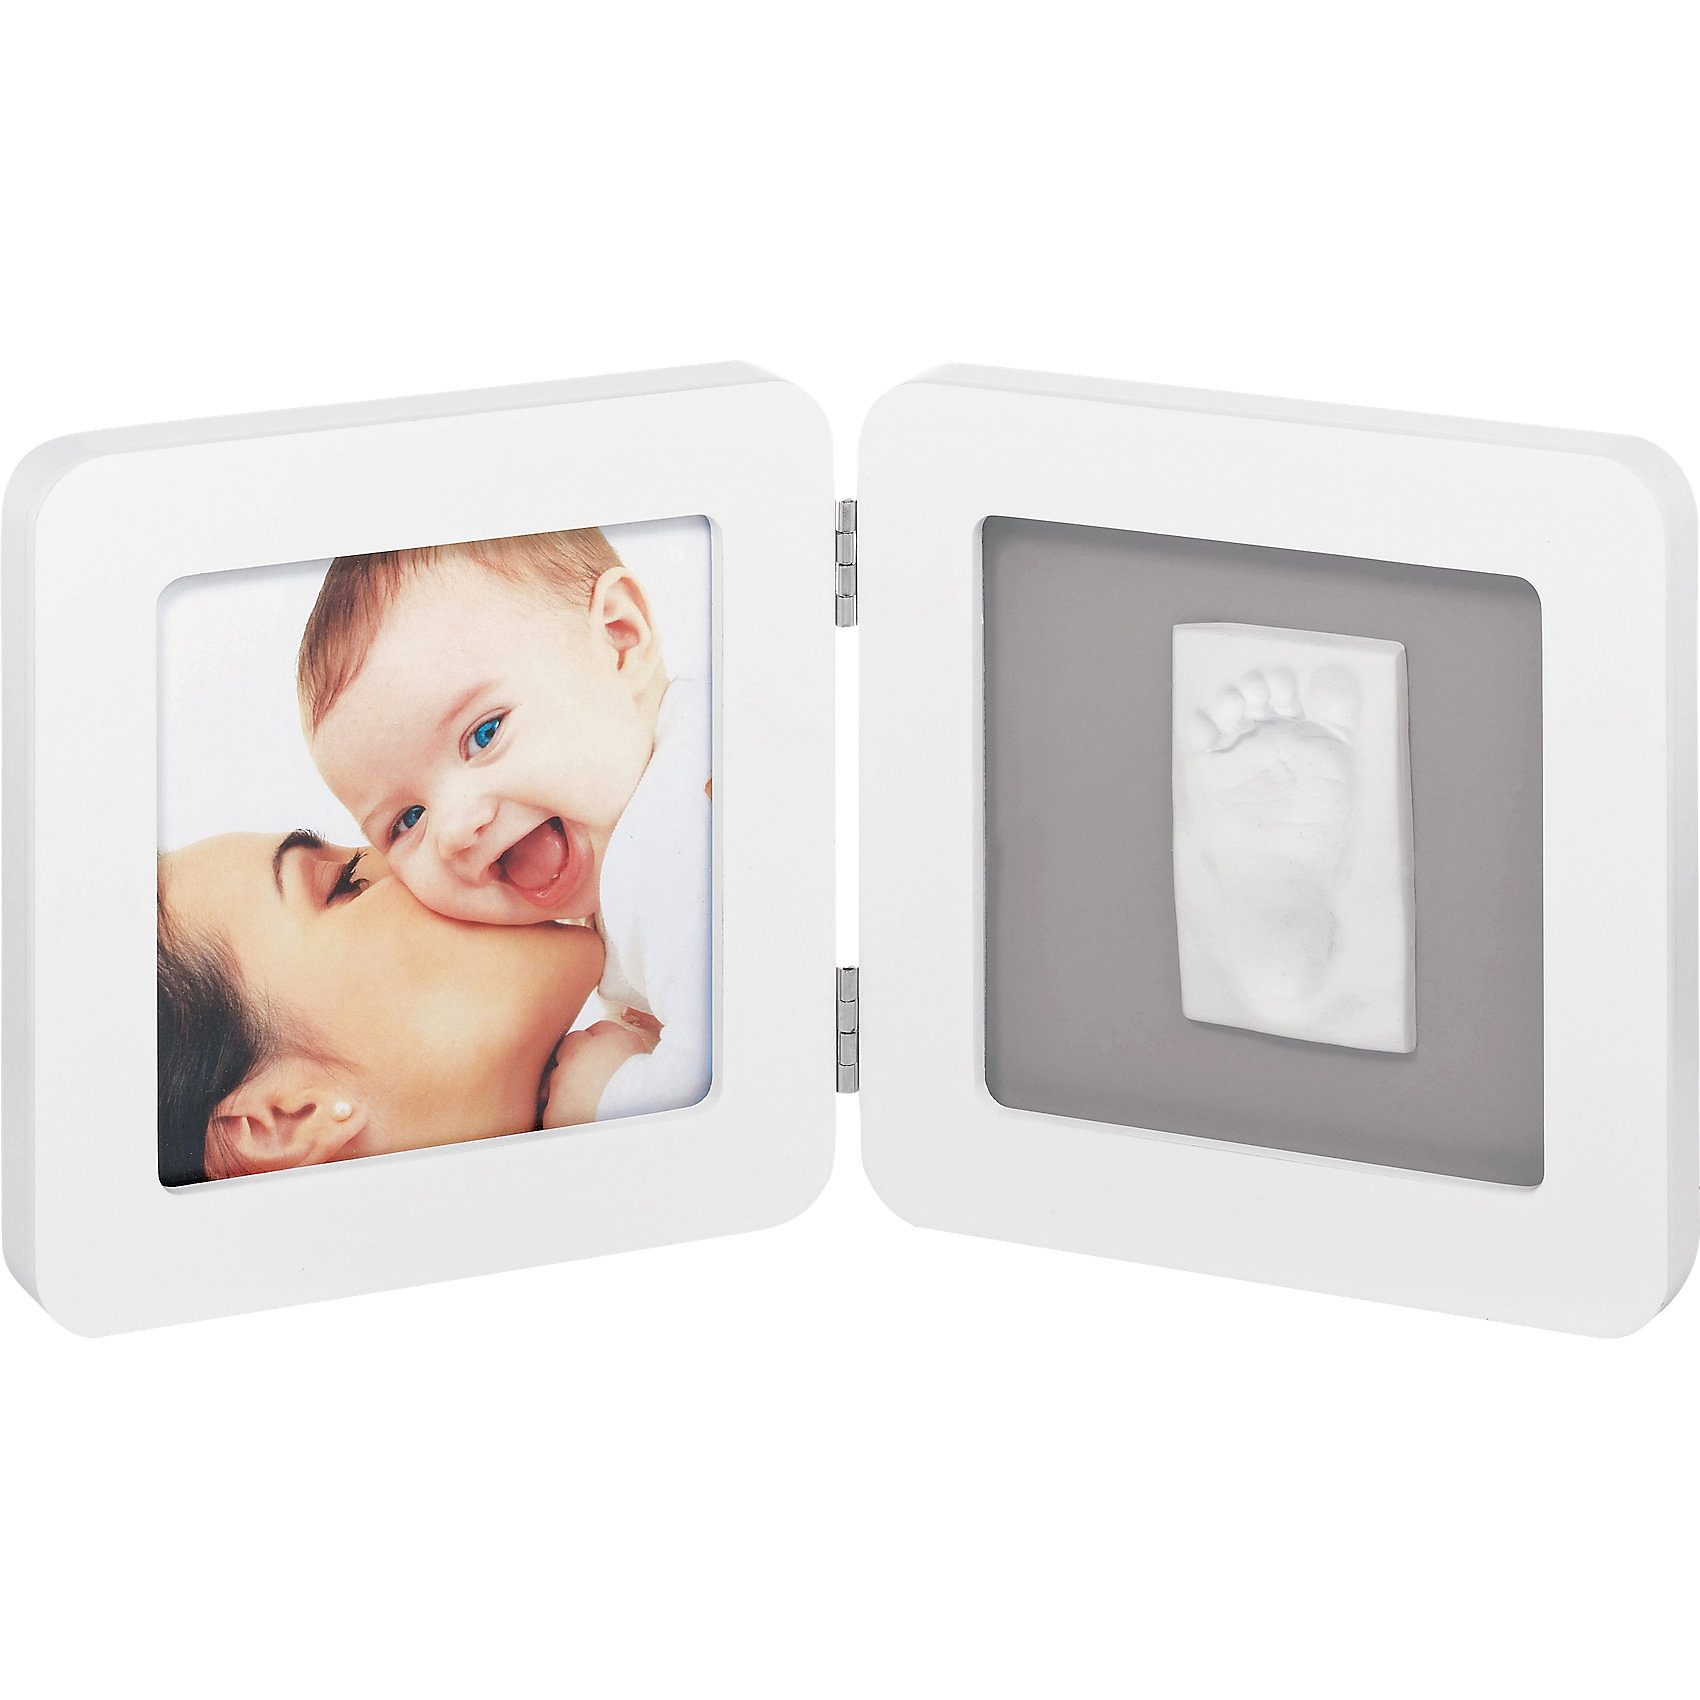 Baby Art Gipsabdruck Set mit 2-tlg. Bilderrahmen, white/grey